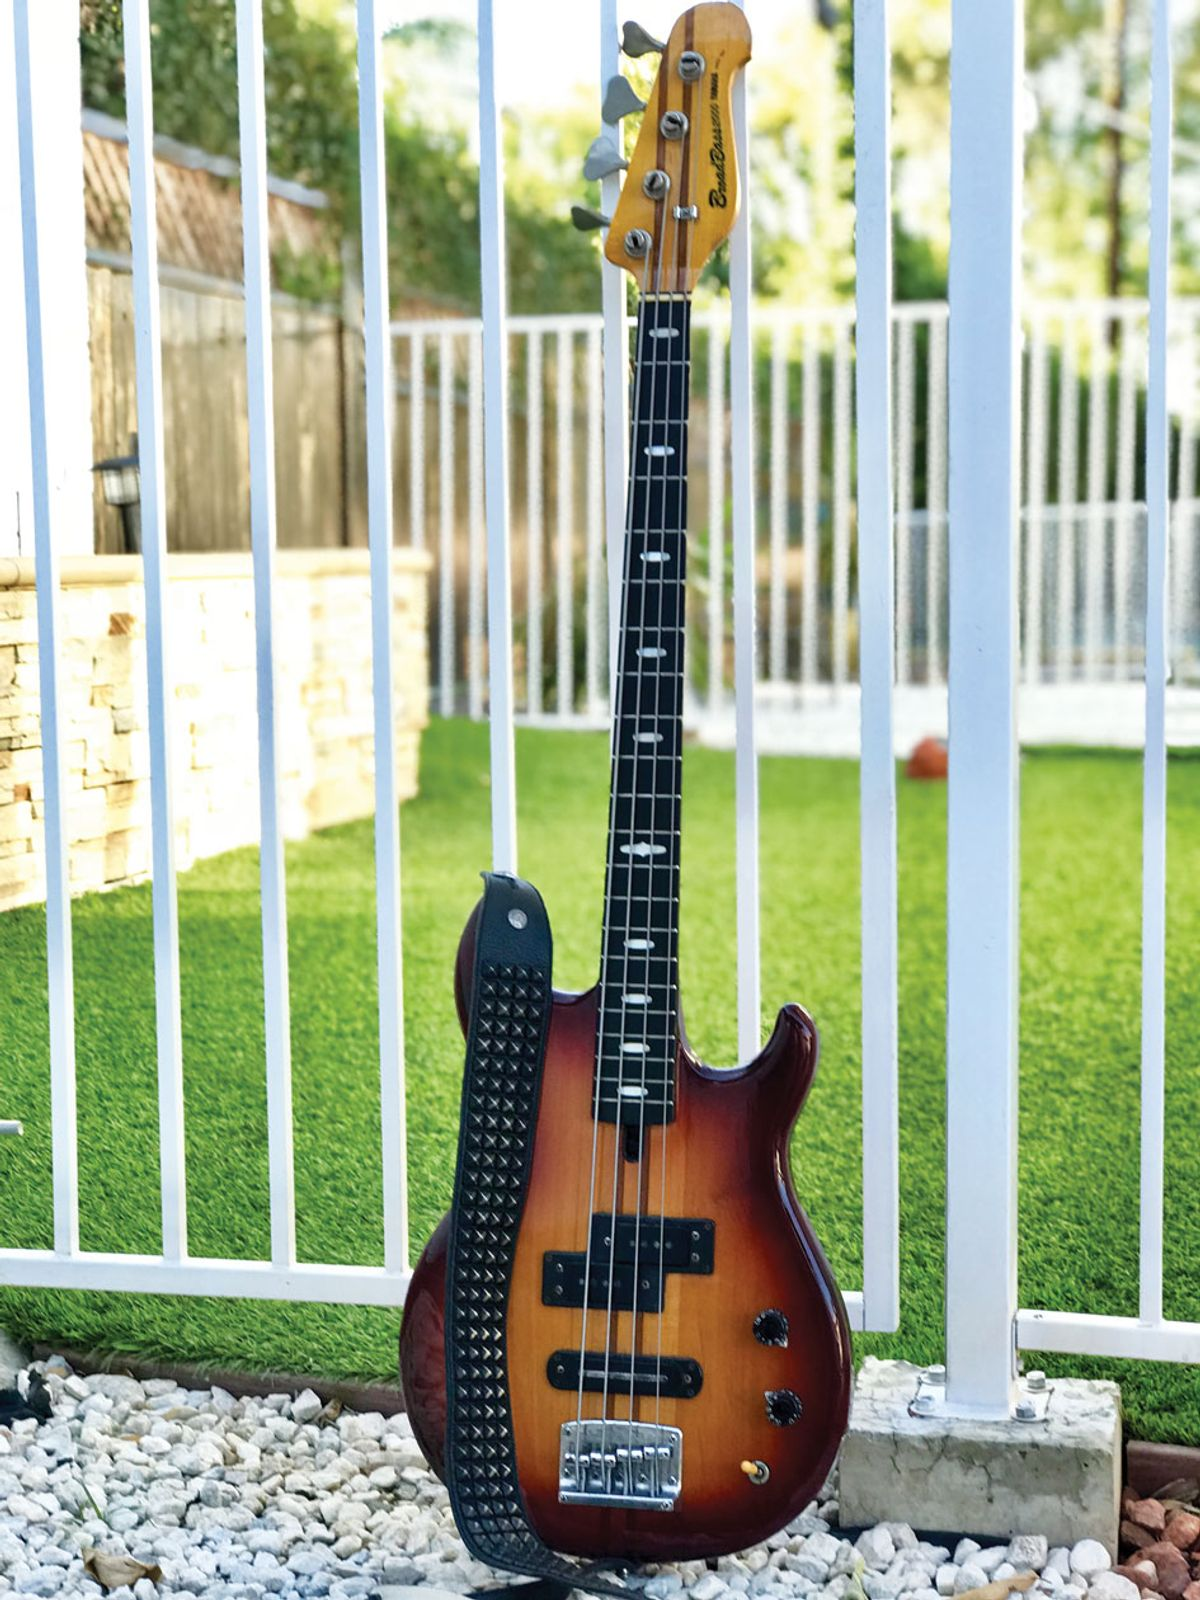 On Bass: Handmade Tone